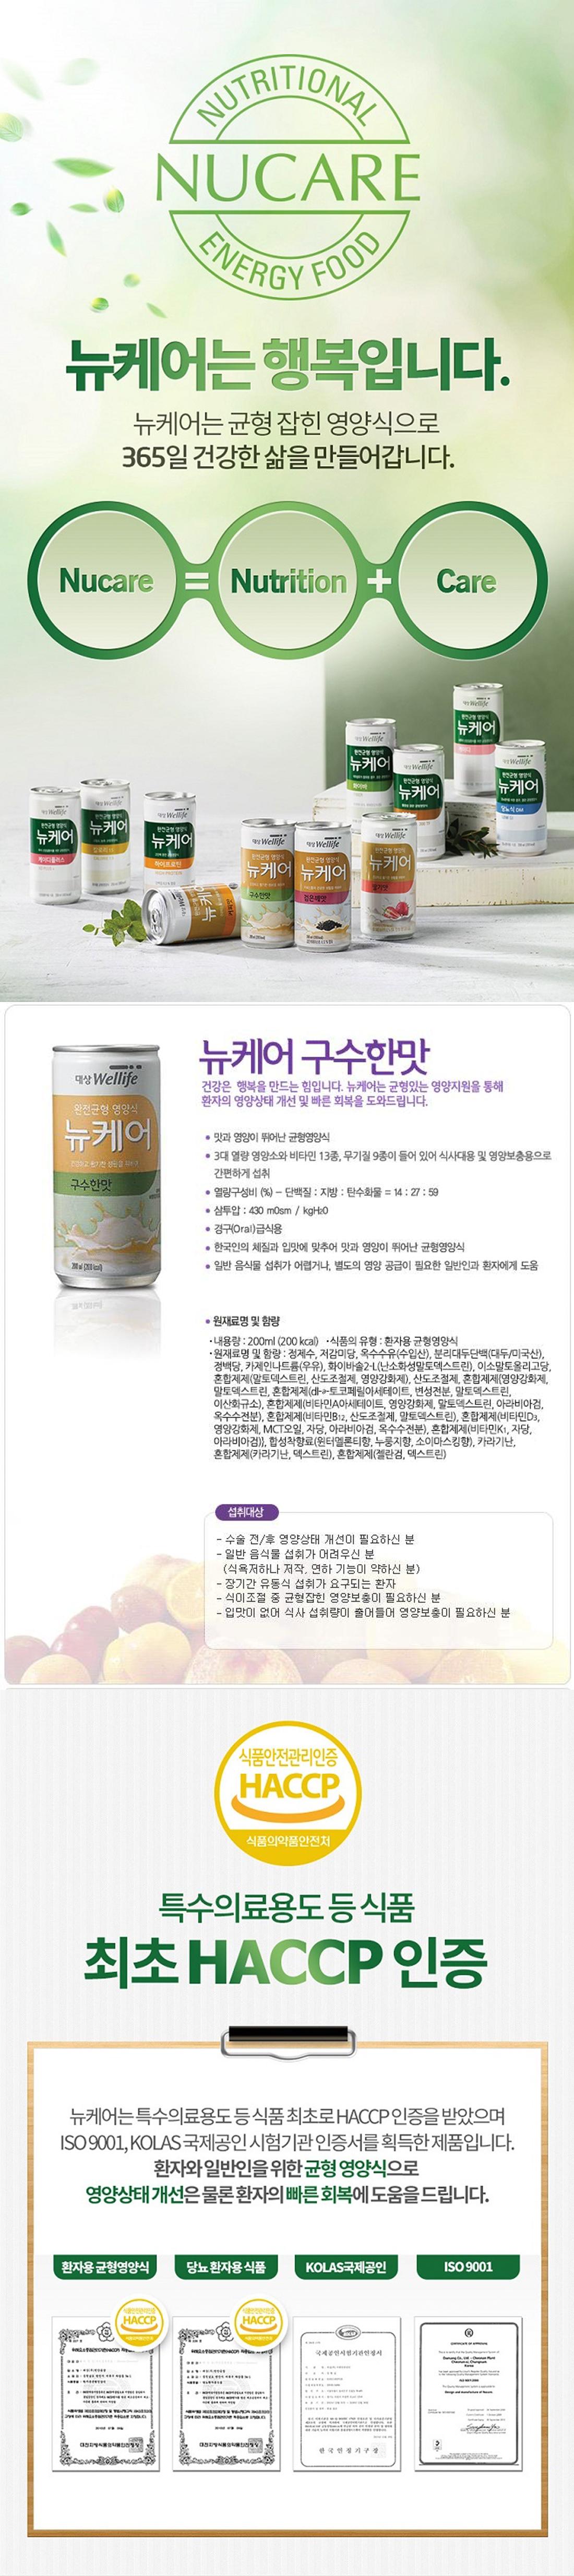 [ wellife ] NU-Care delicate flavor 200ml X 30